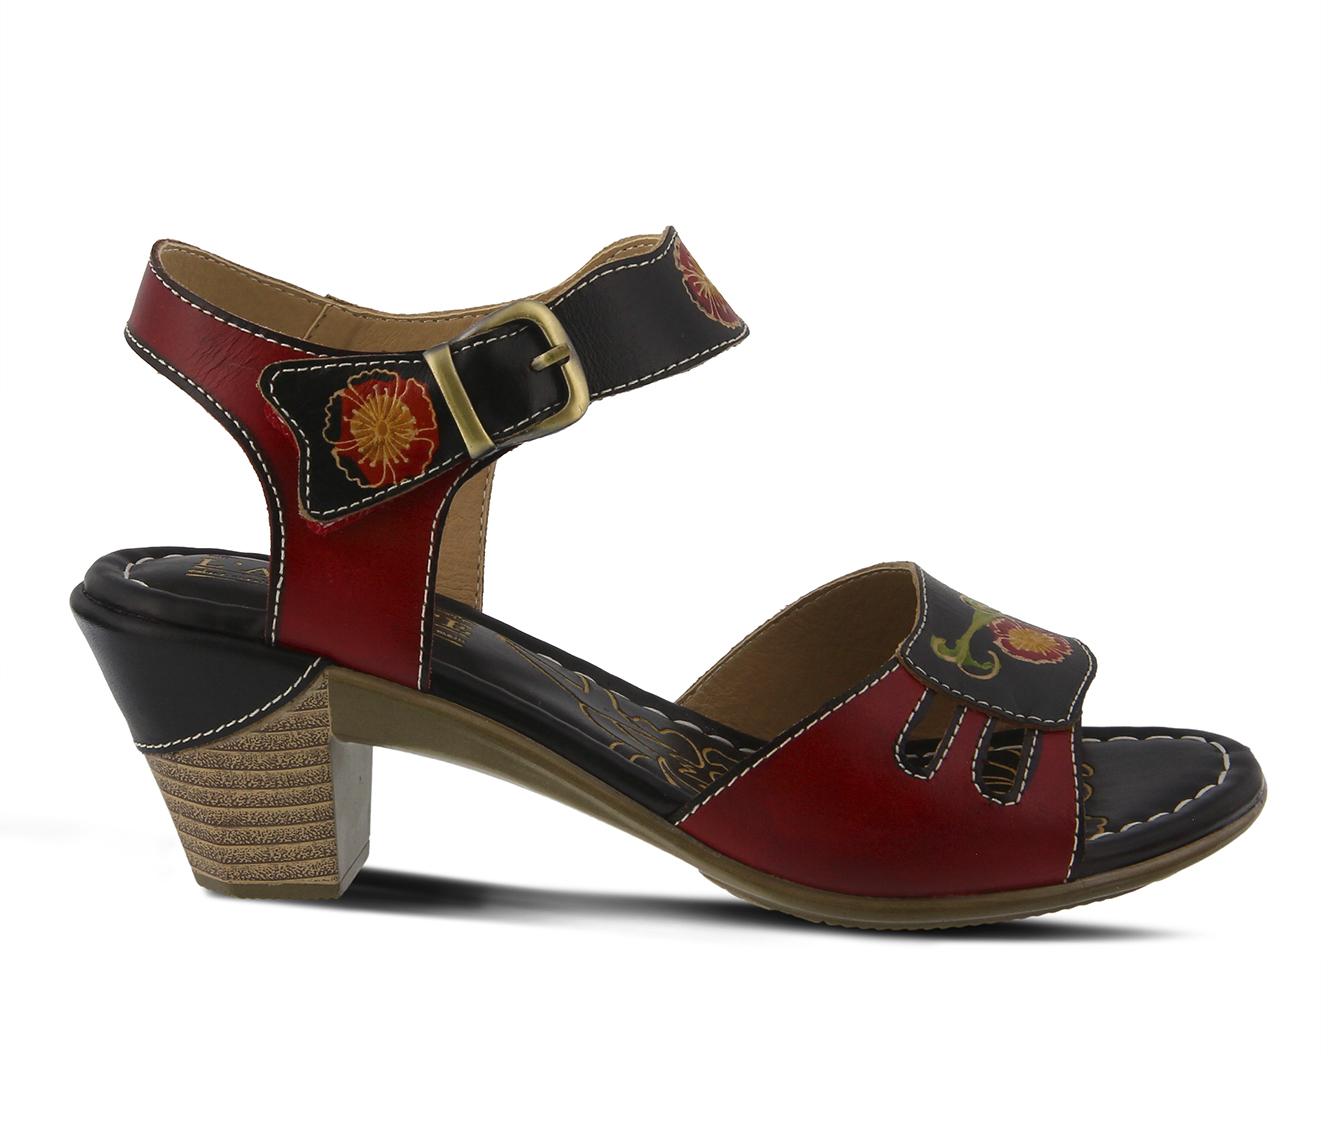 L'Artiste Kyleta Women's Dress Shoe (Black Leather)